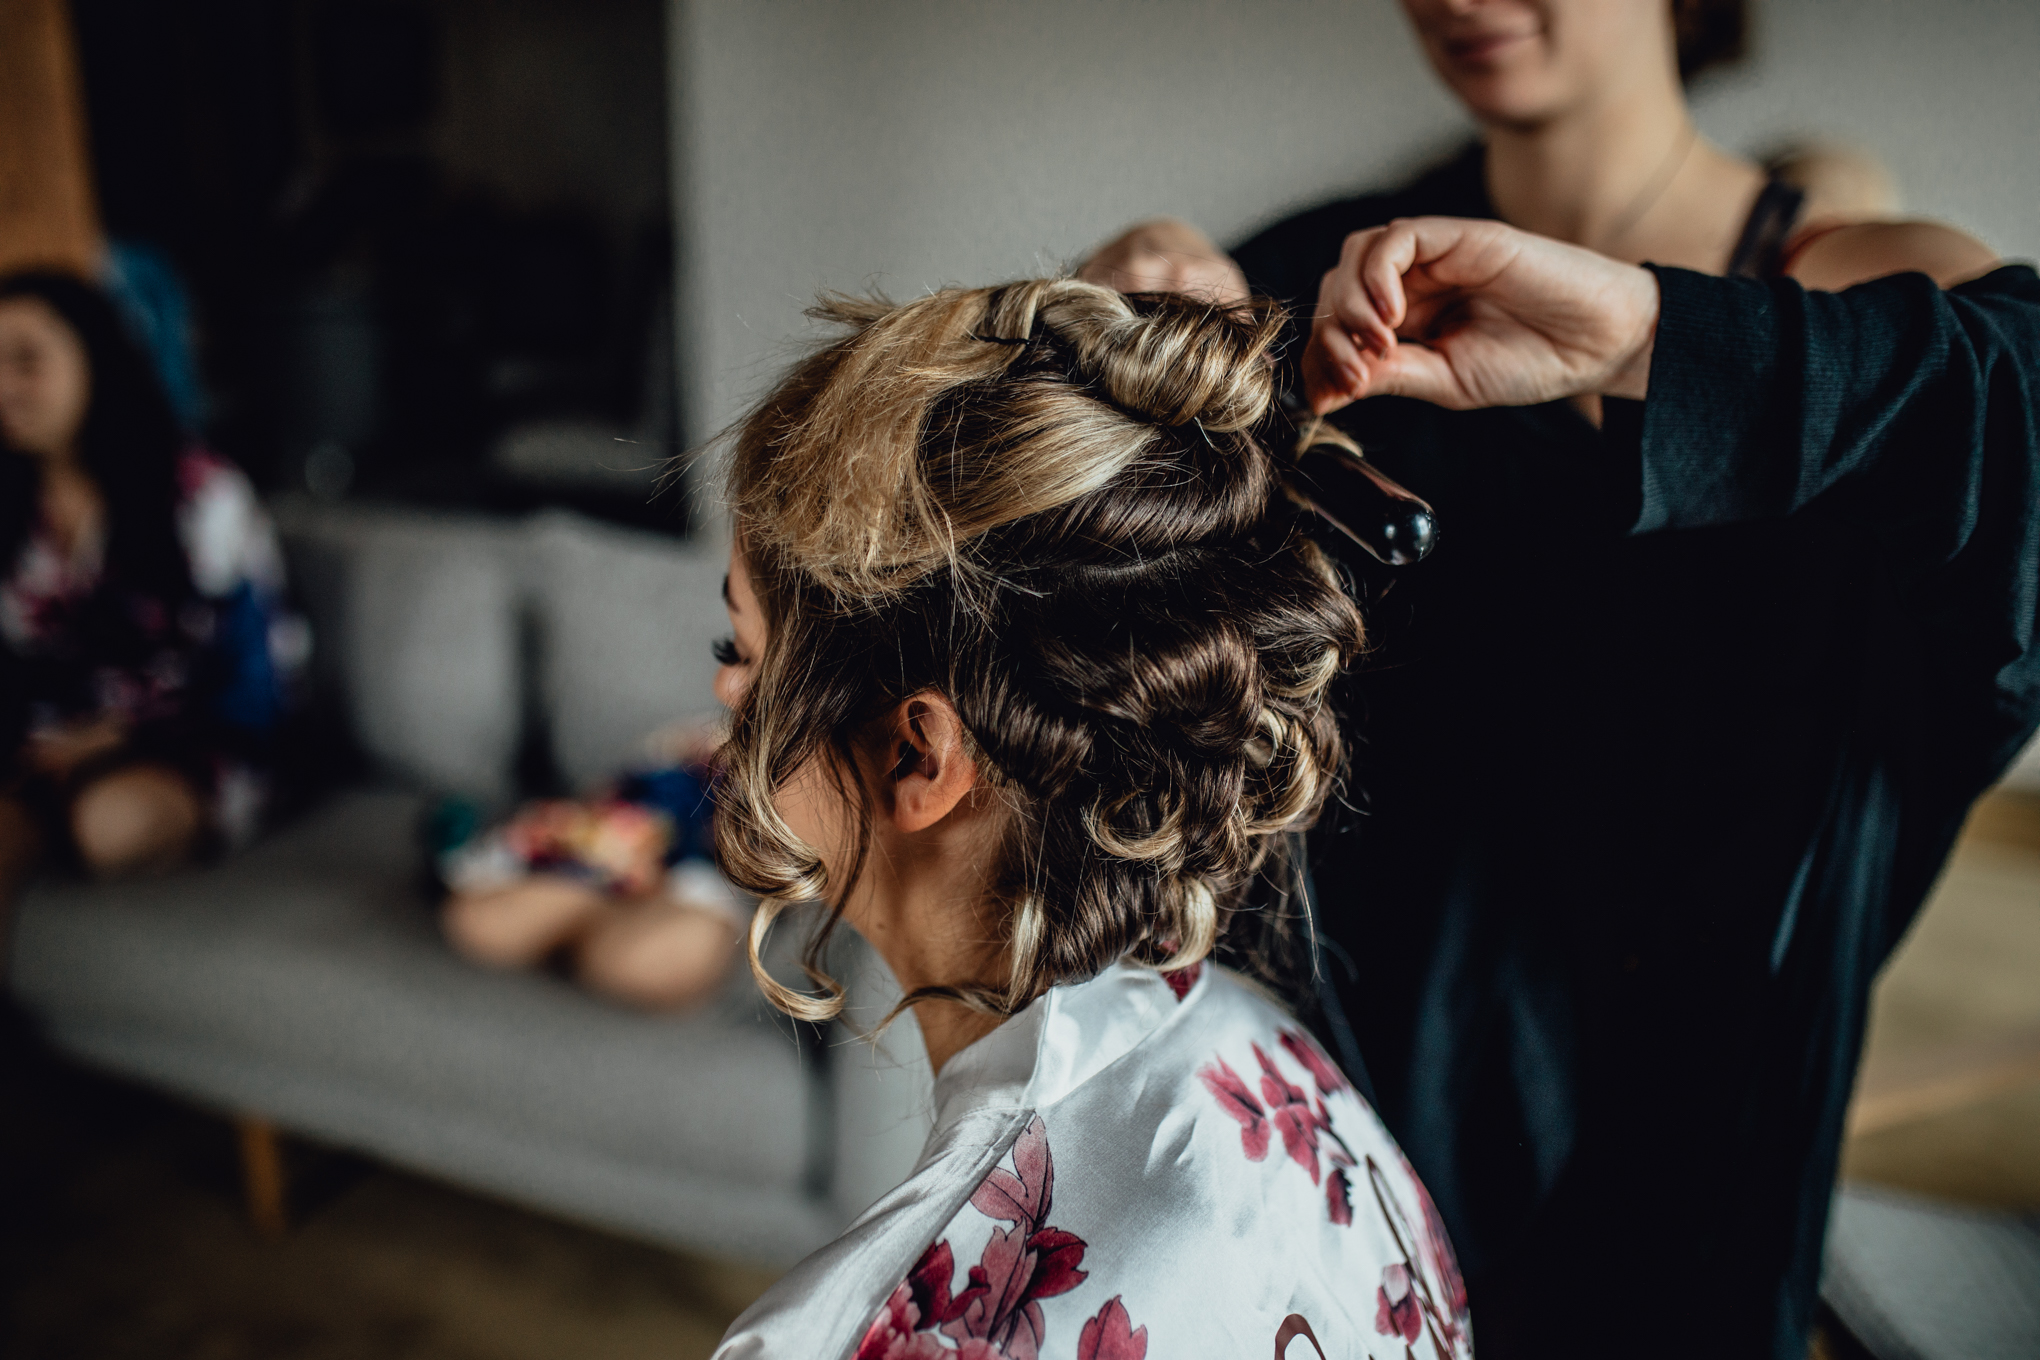 bride-getting-her-hair-done-on-wedding-day.jpg